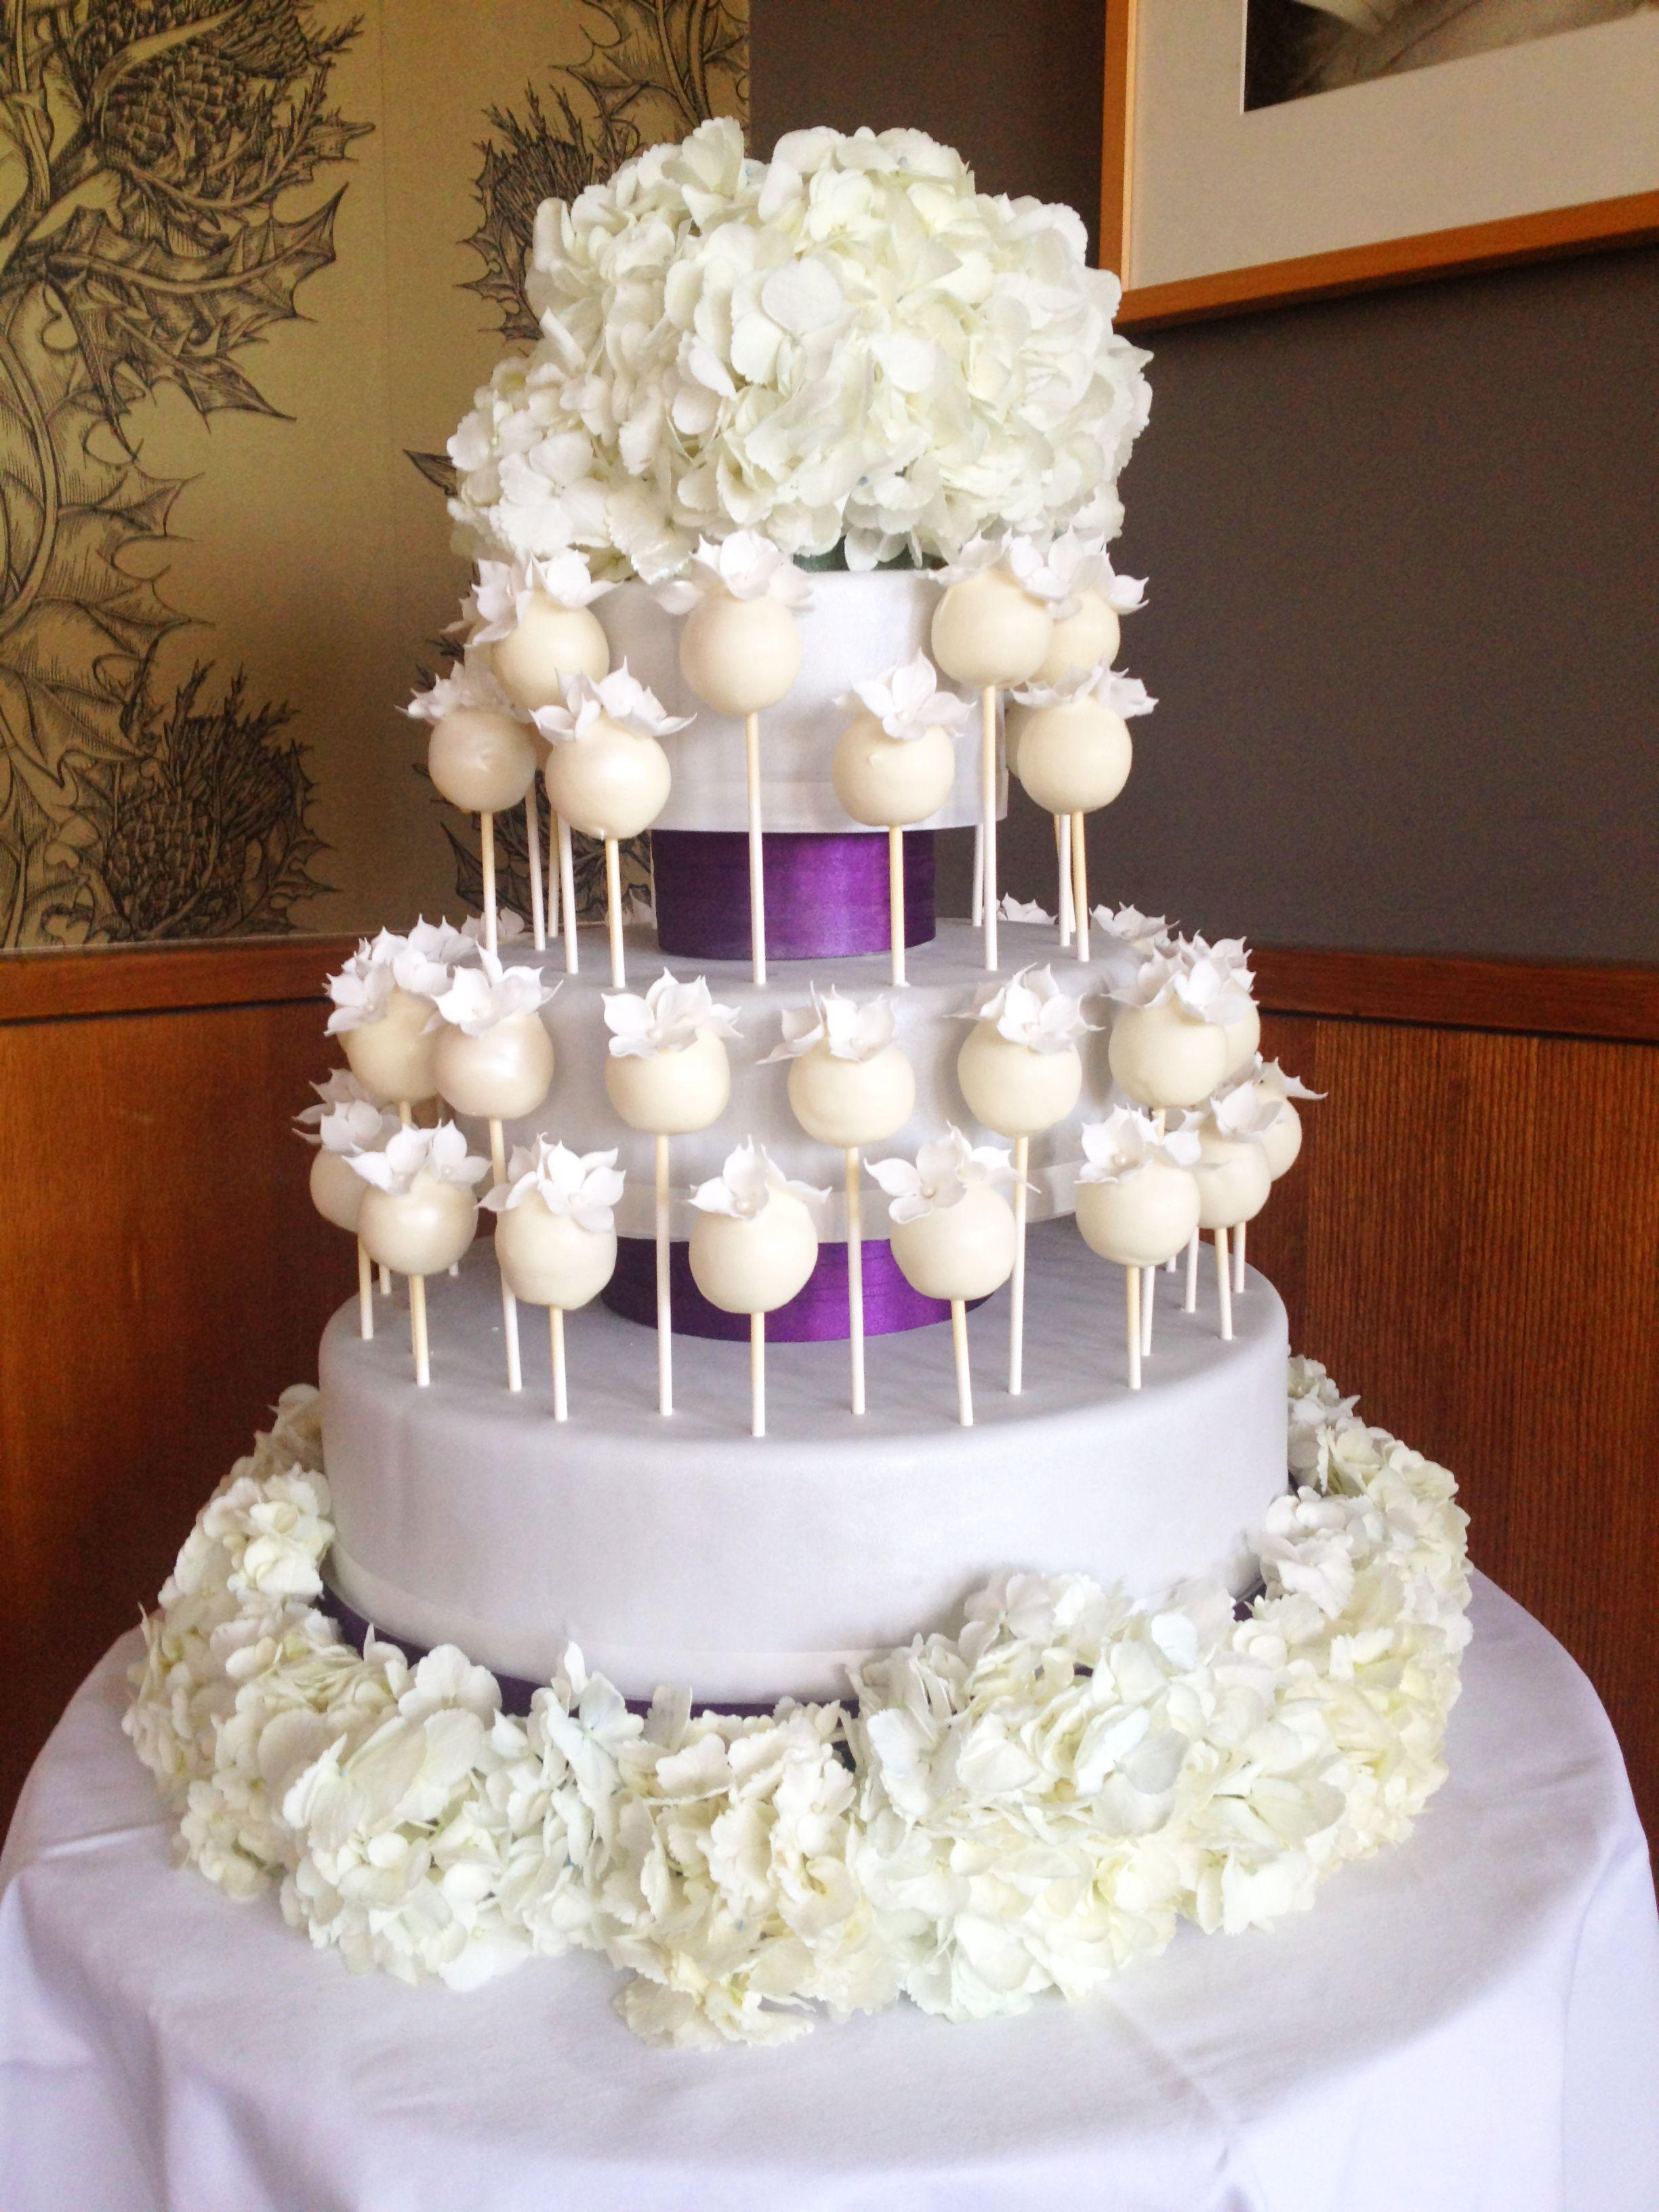 Cake pop wedding cake with sugar and fresh hydrangeas